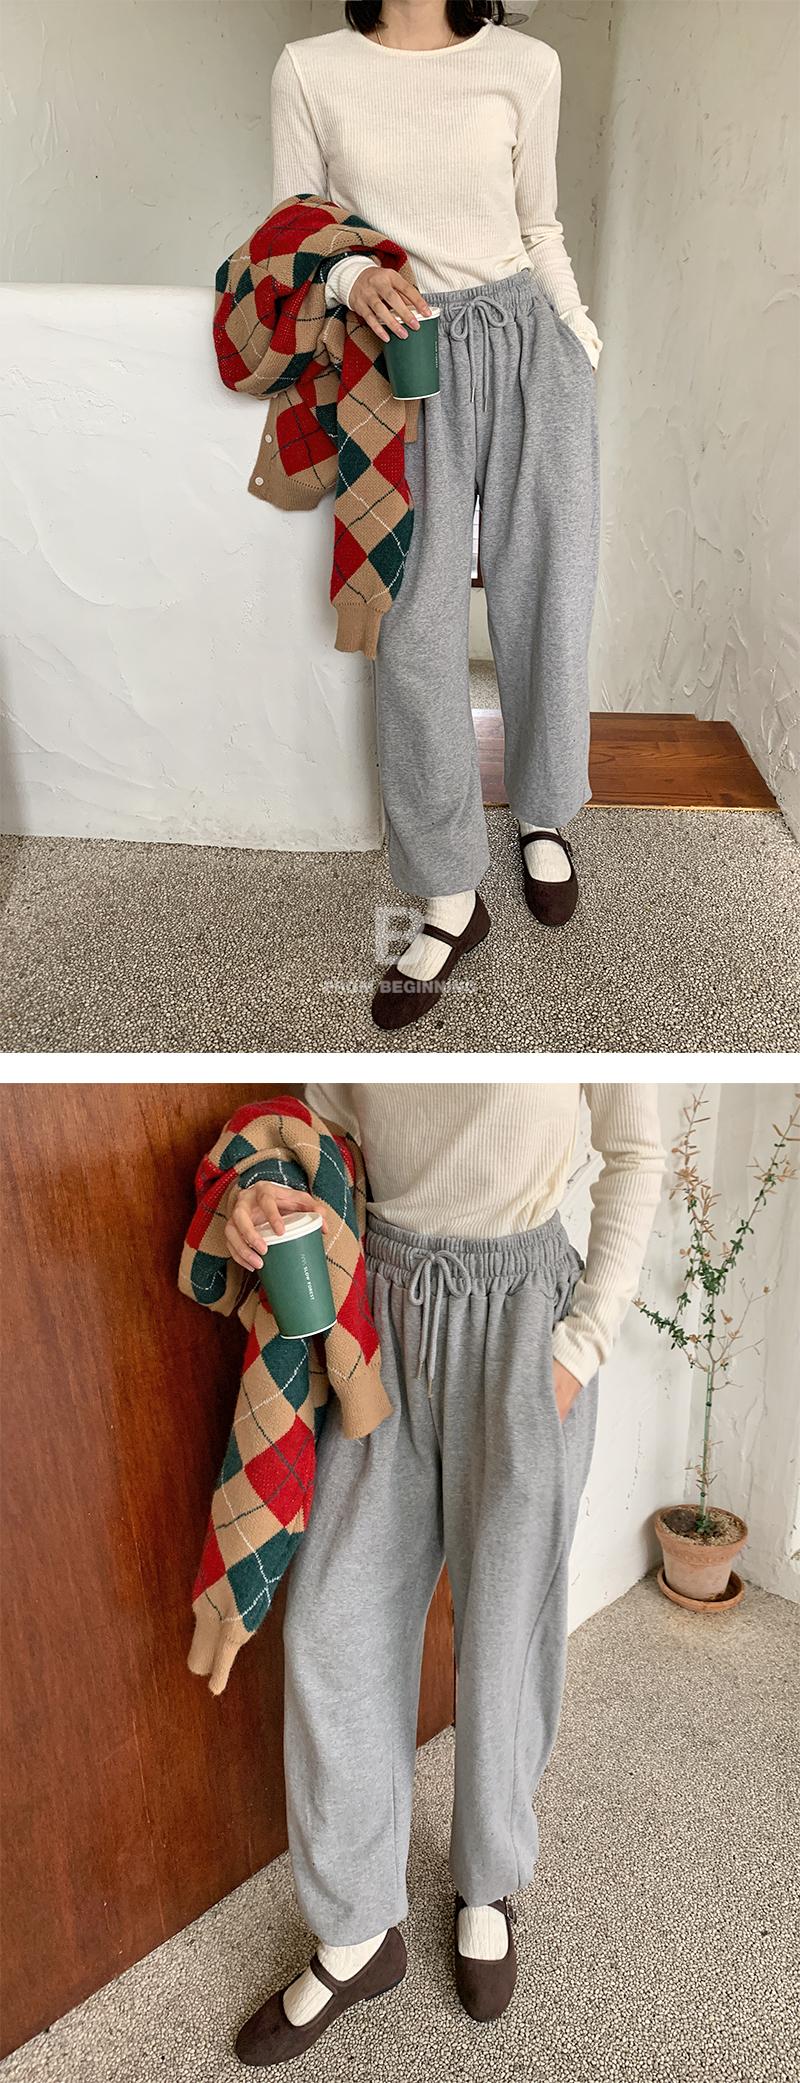 Milan Banding Jogger Pants